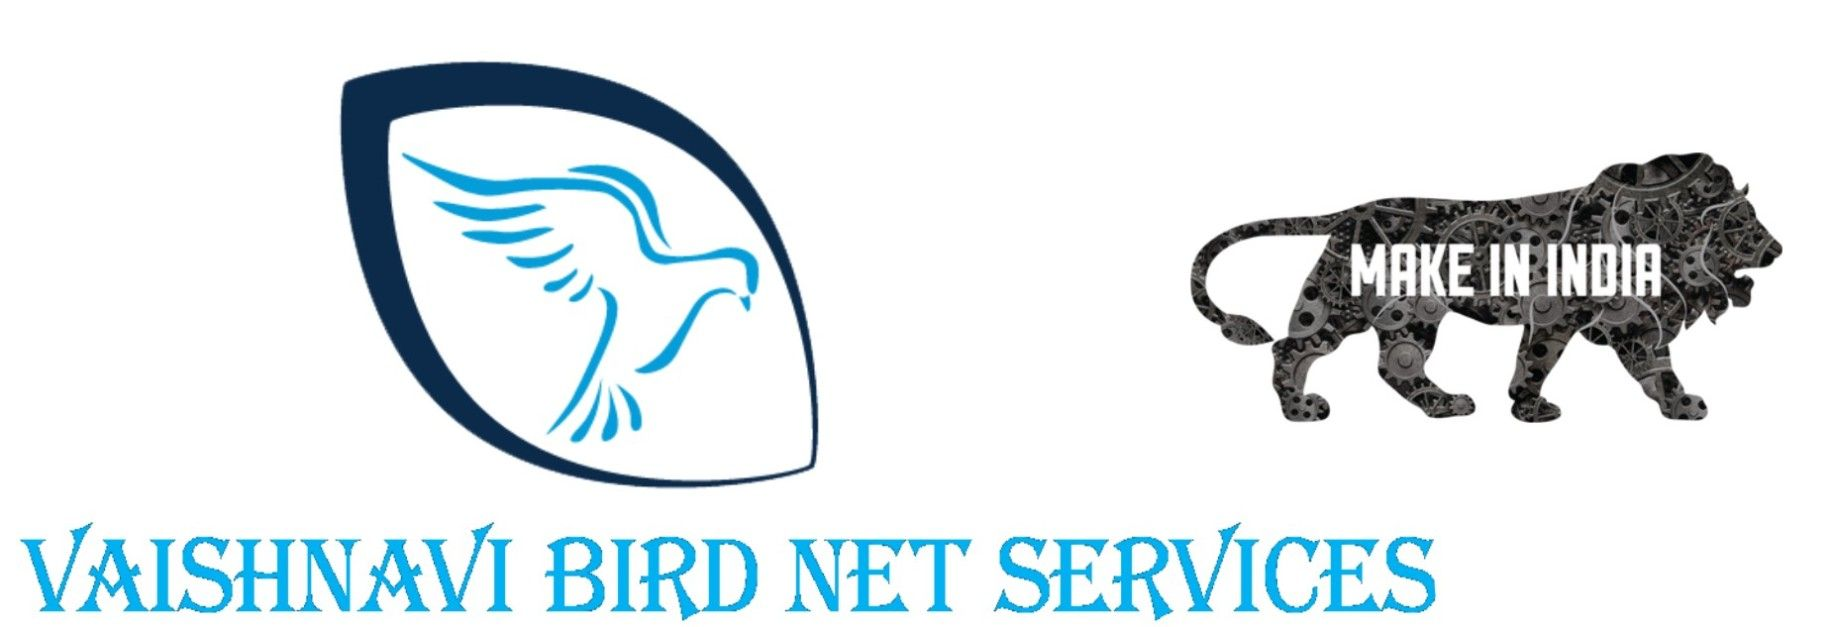 Vaishnavi Net Services Is Offering Bird Net Services Safety Net Services All Types Of Balcony And Terrace Window Net Fitting Bird Netting Bird Service